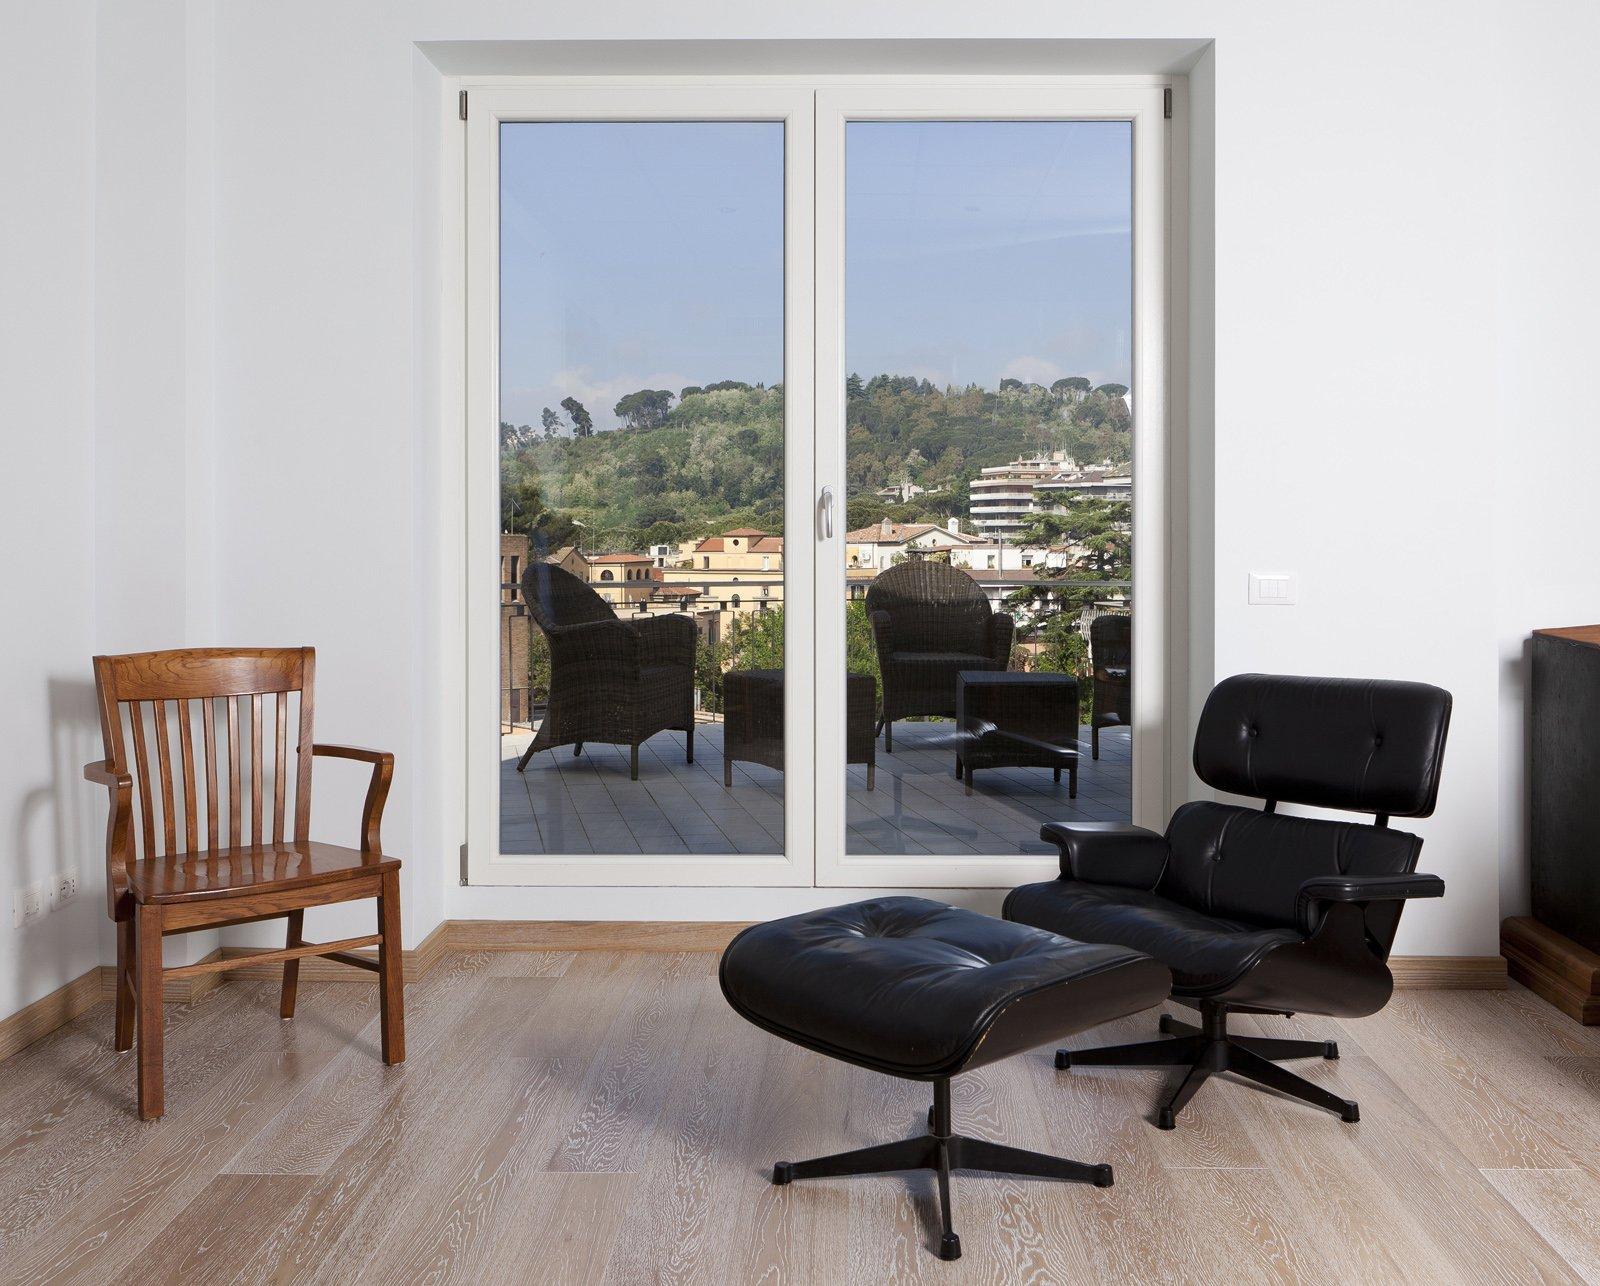 Finestre tipi di apertura cose di casa for Finestre scorrevoli usate